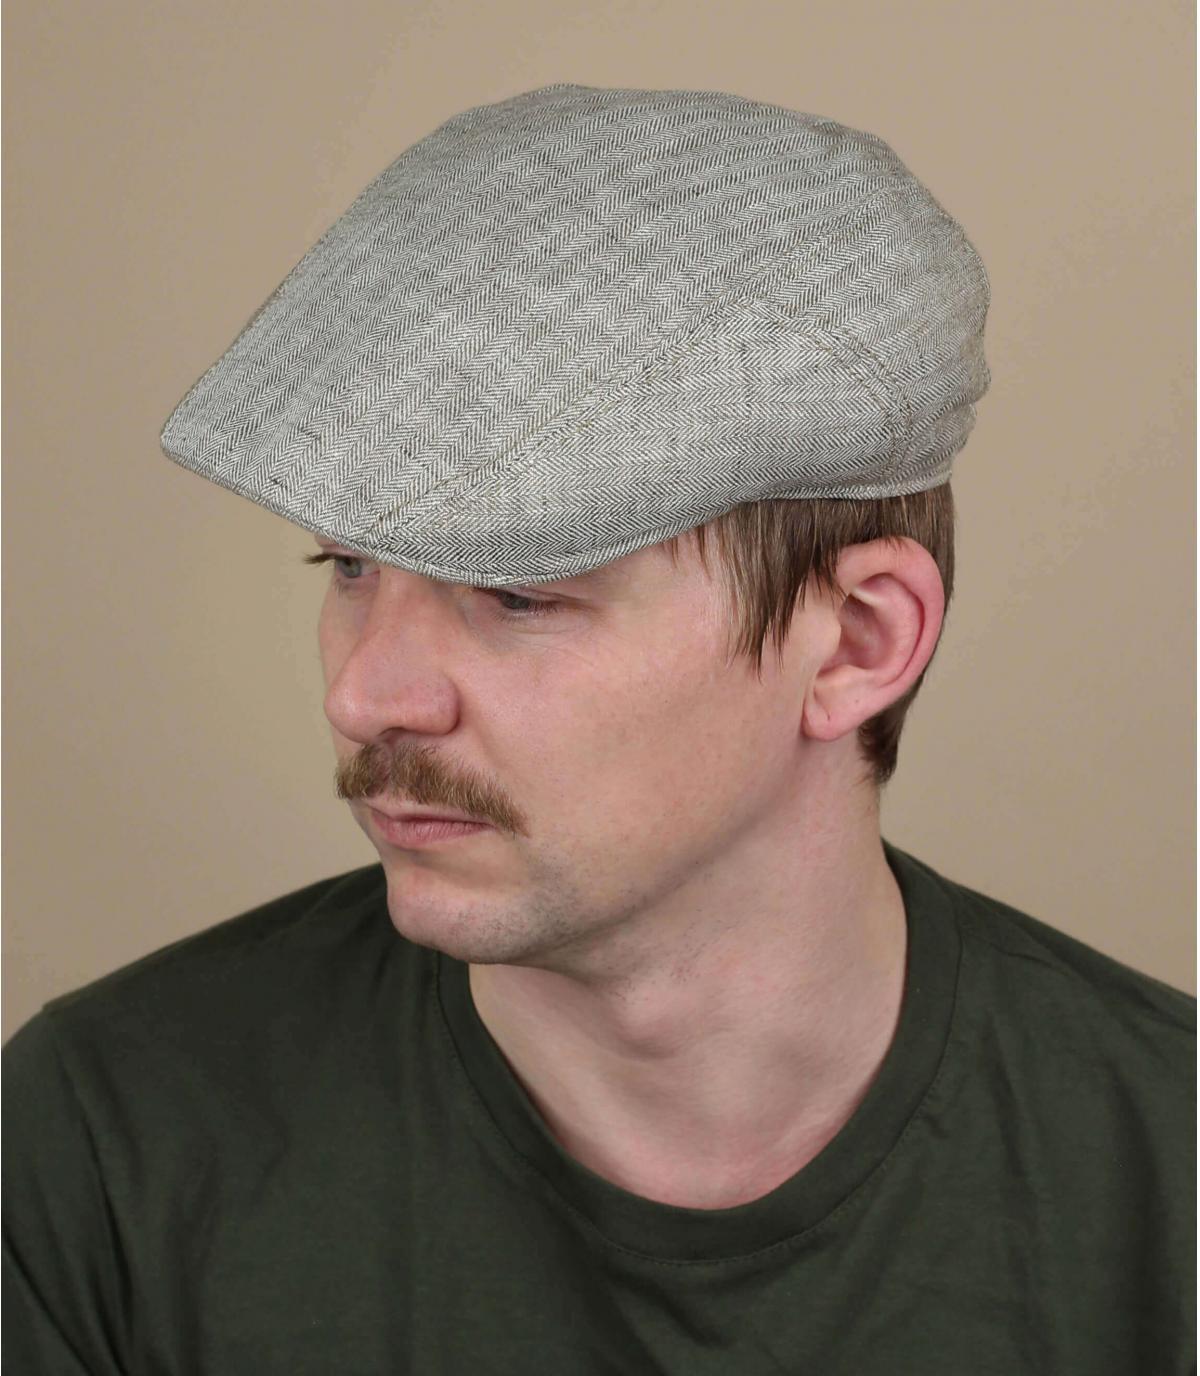 khaki ivy cap- Online ivy caps shop 8a5d65dadd8b